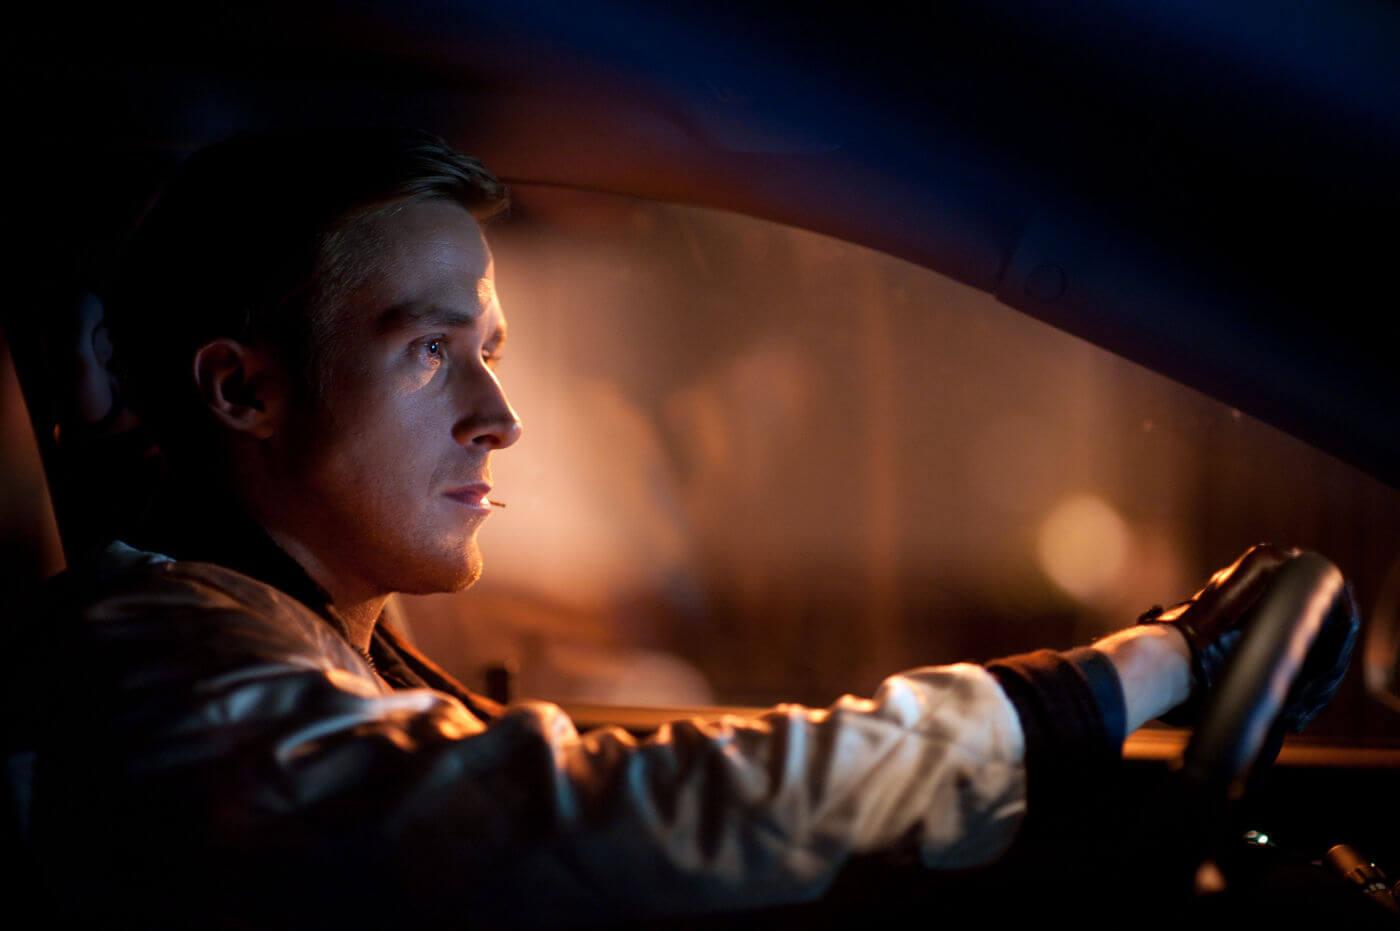 drive-2011-movie-ryan-gosling-nicholas-winding-refn